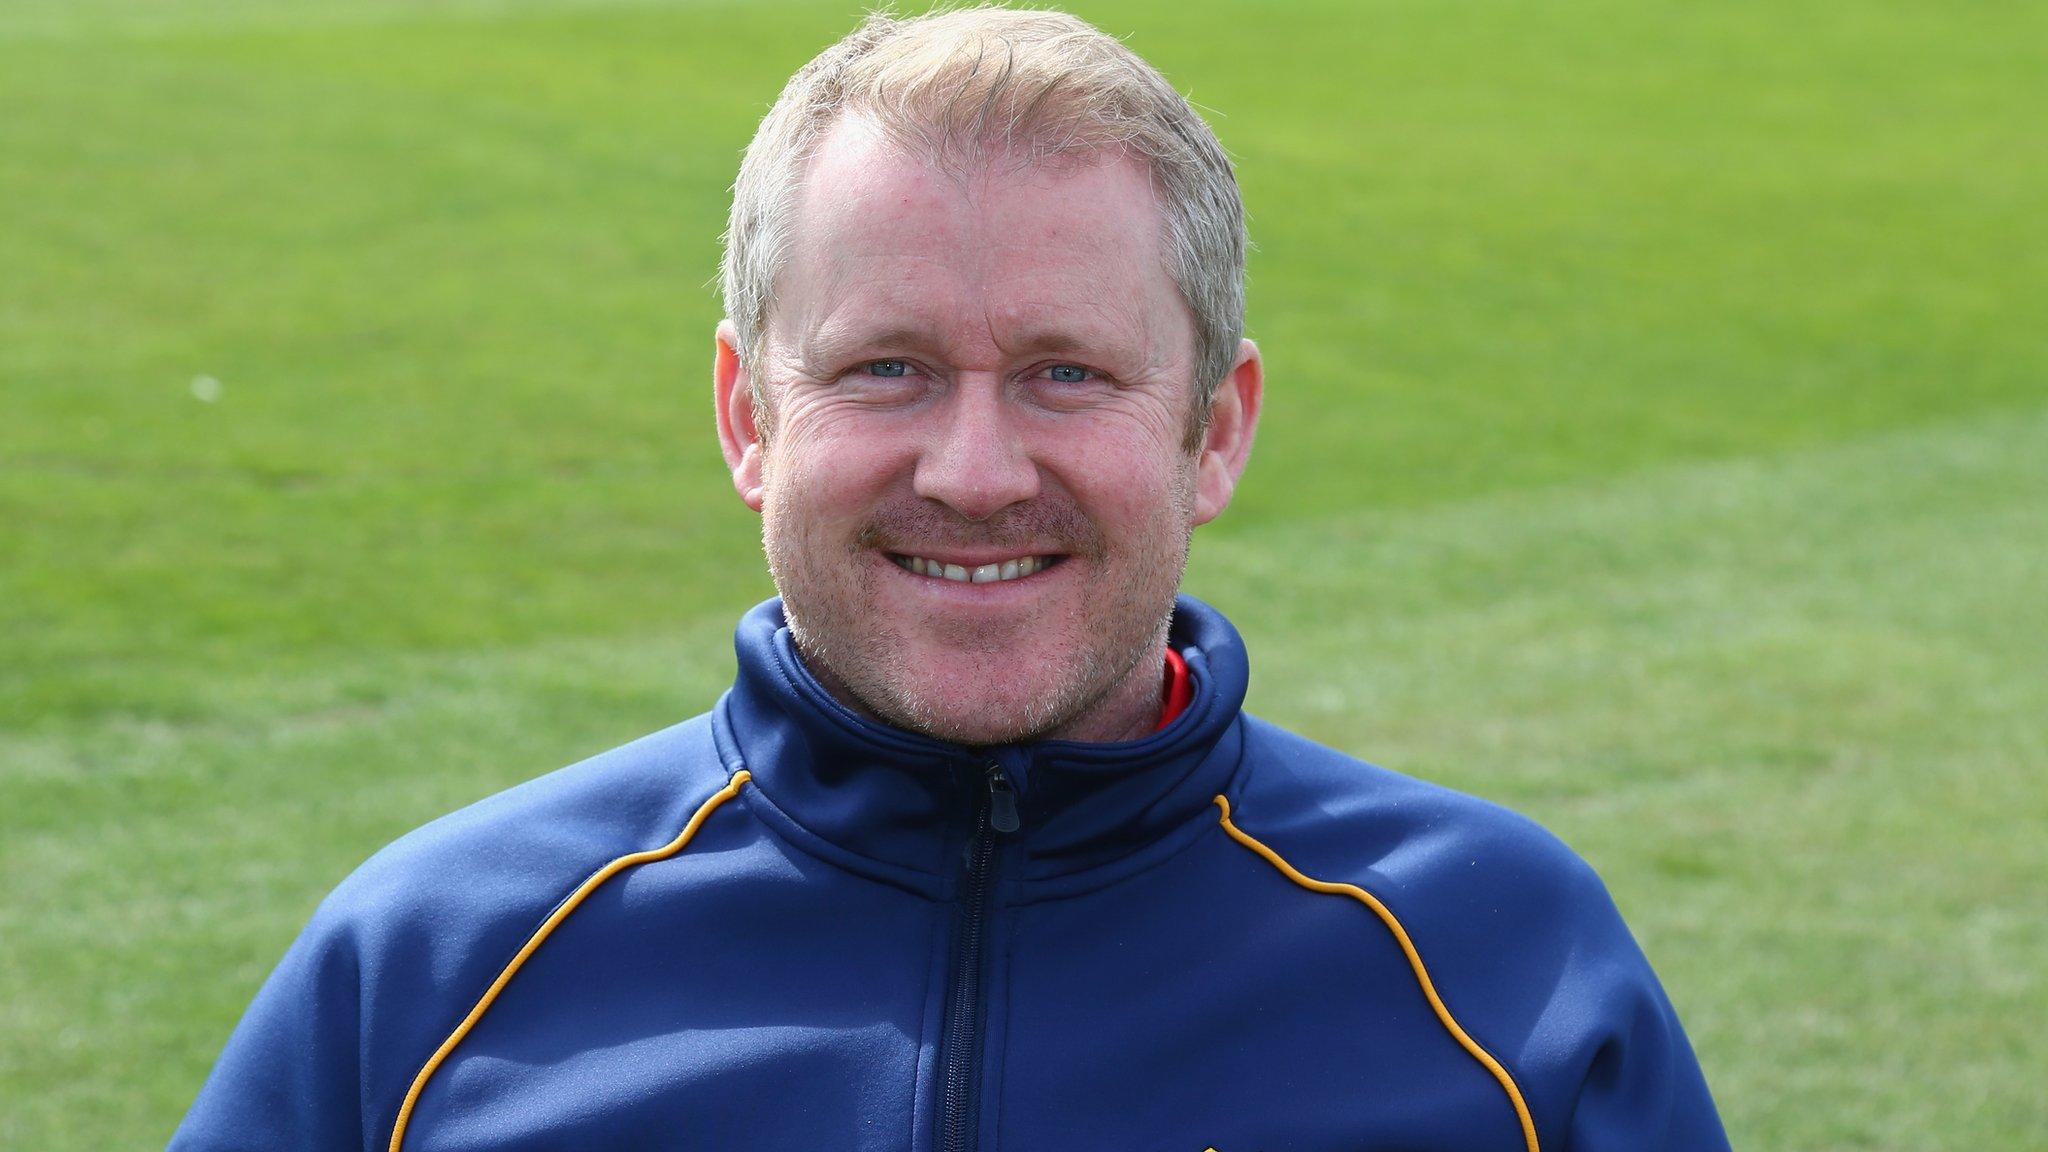 Champions Essex name McGrath as head coach